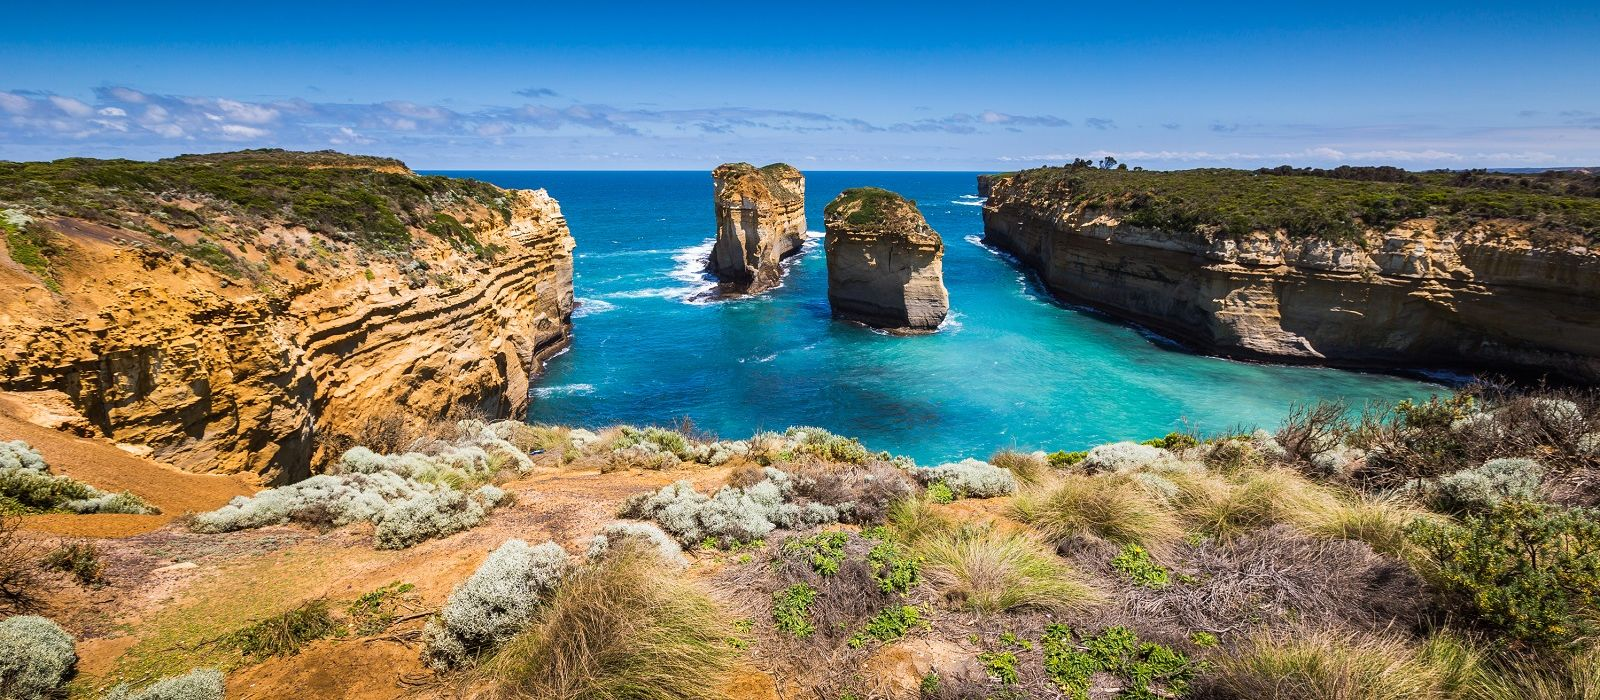 Australia: Cities, National Parks & Beaches Tour Trip 5